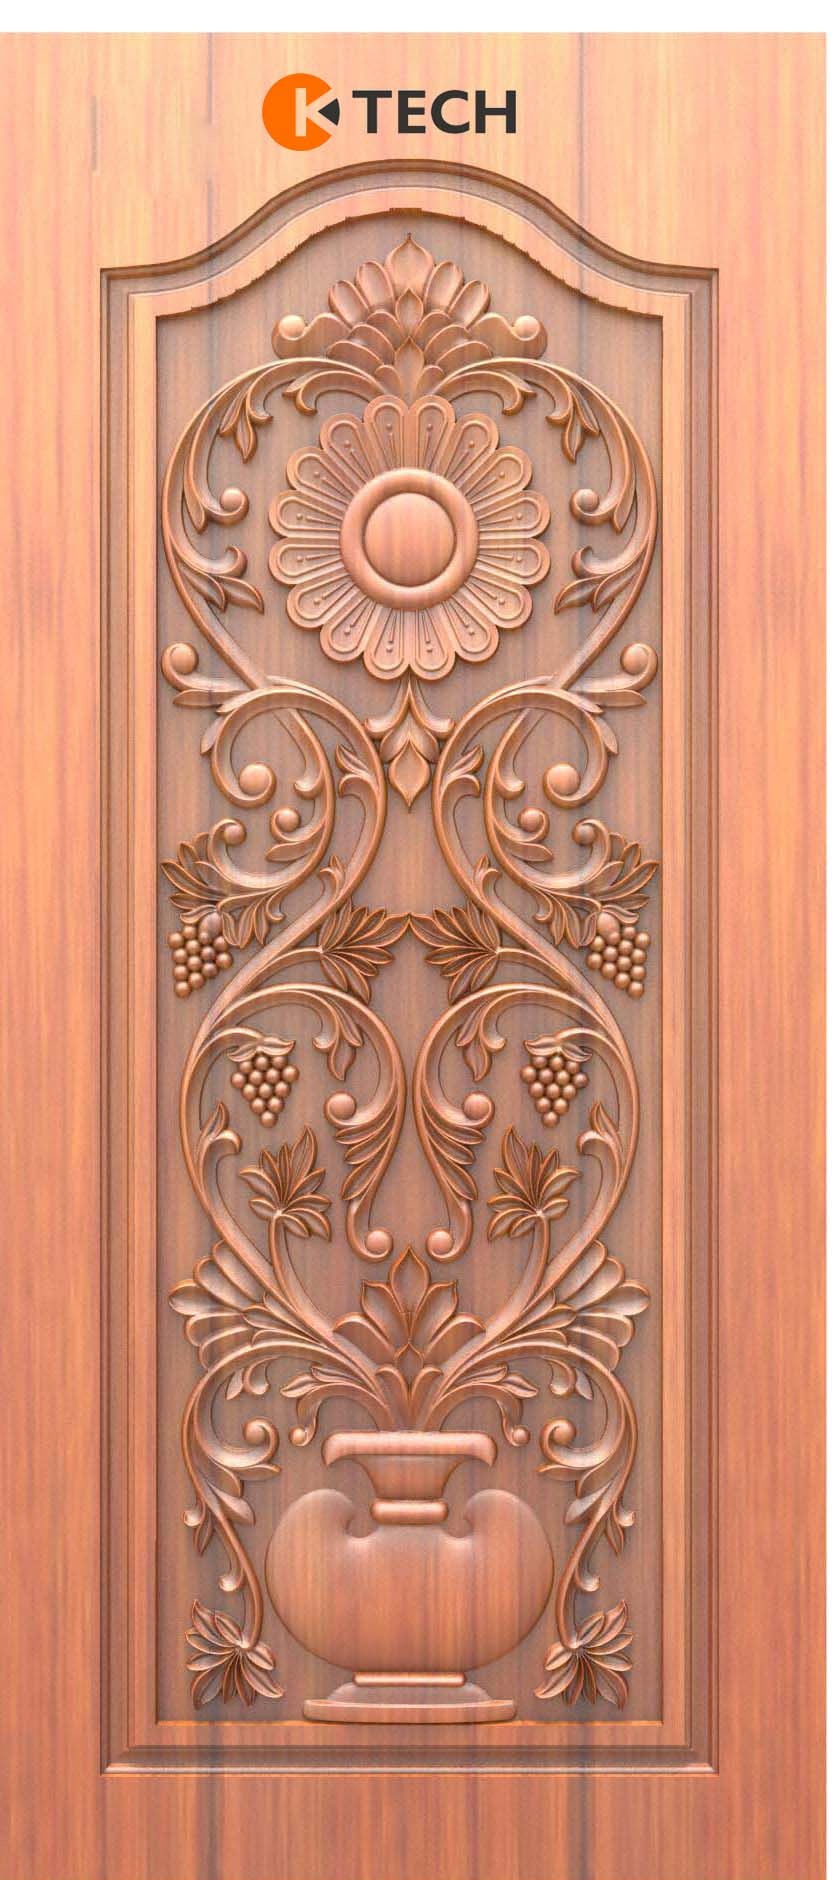 K-TECH CNC Doors Design 174